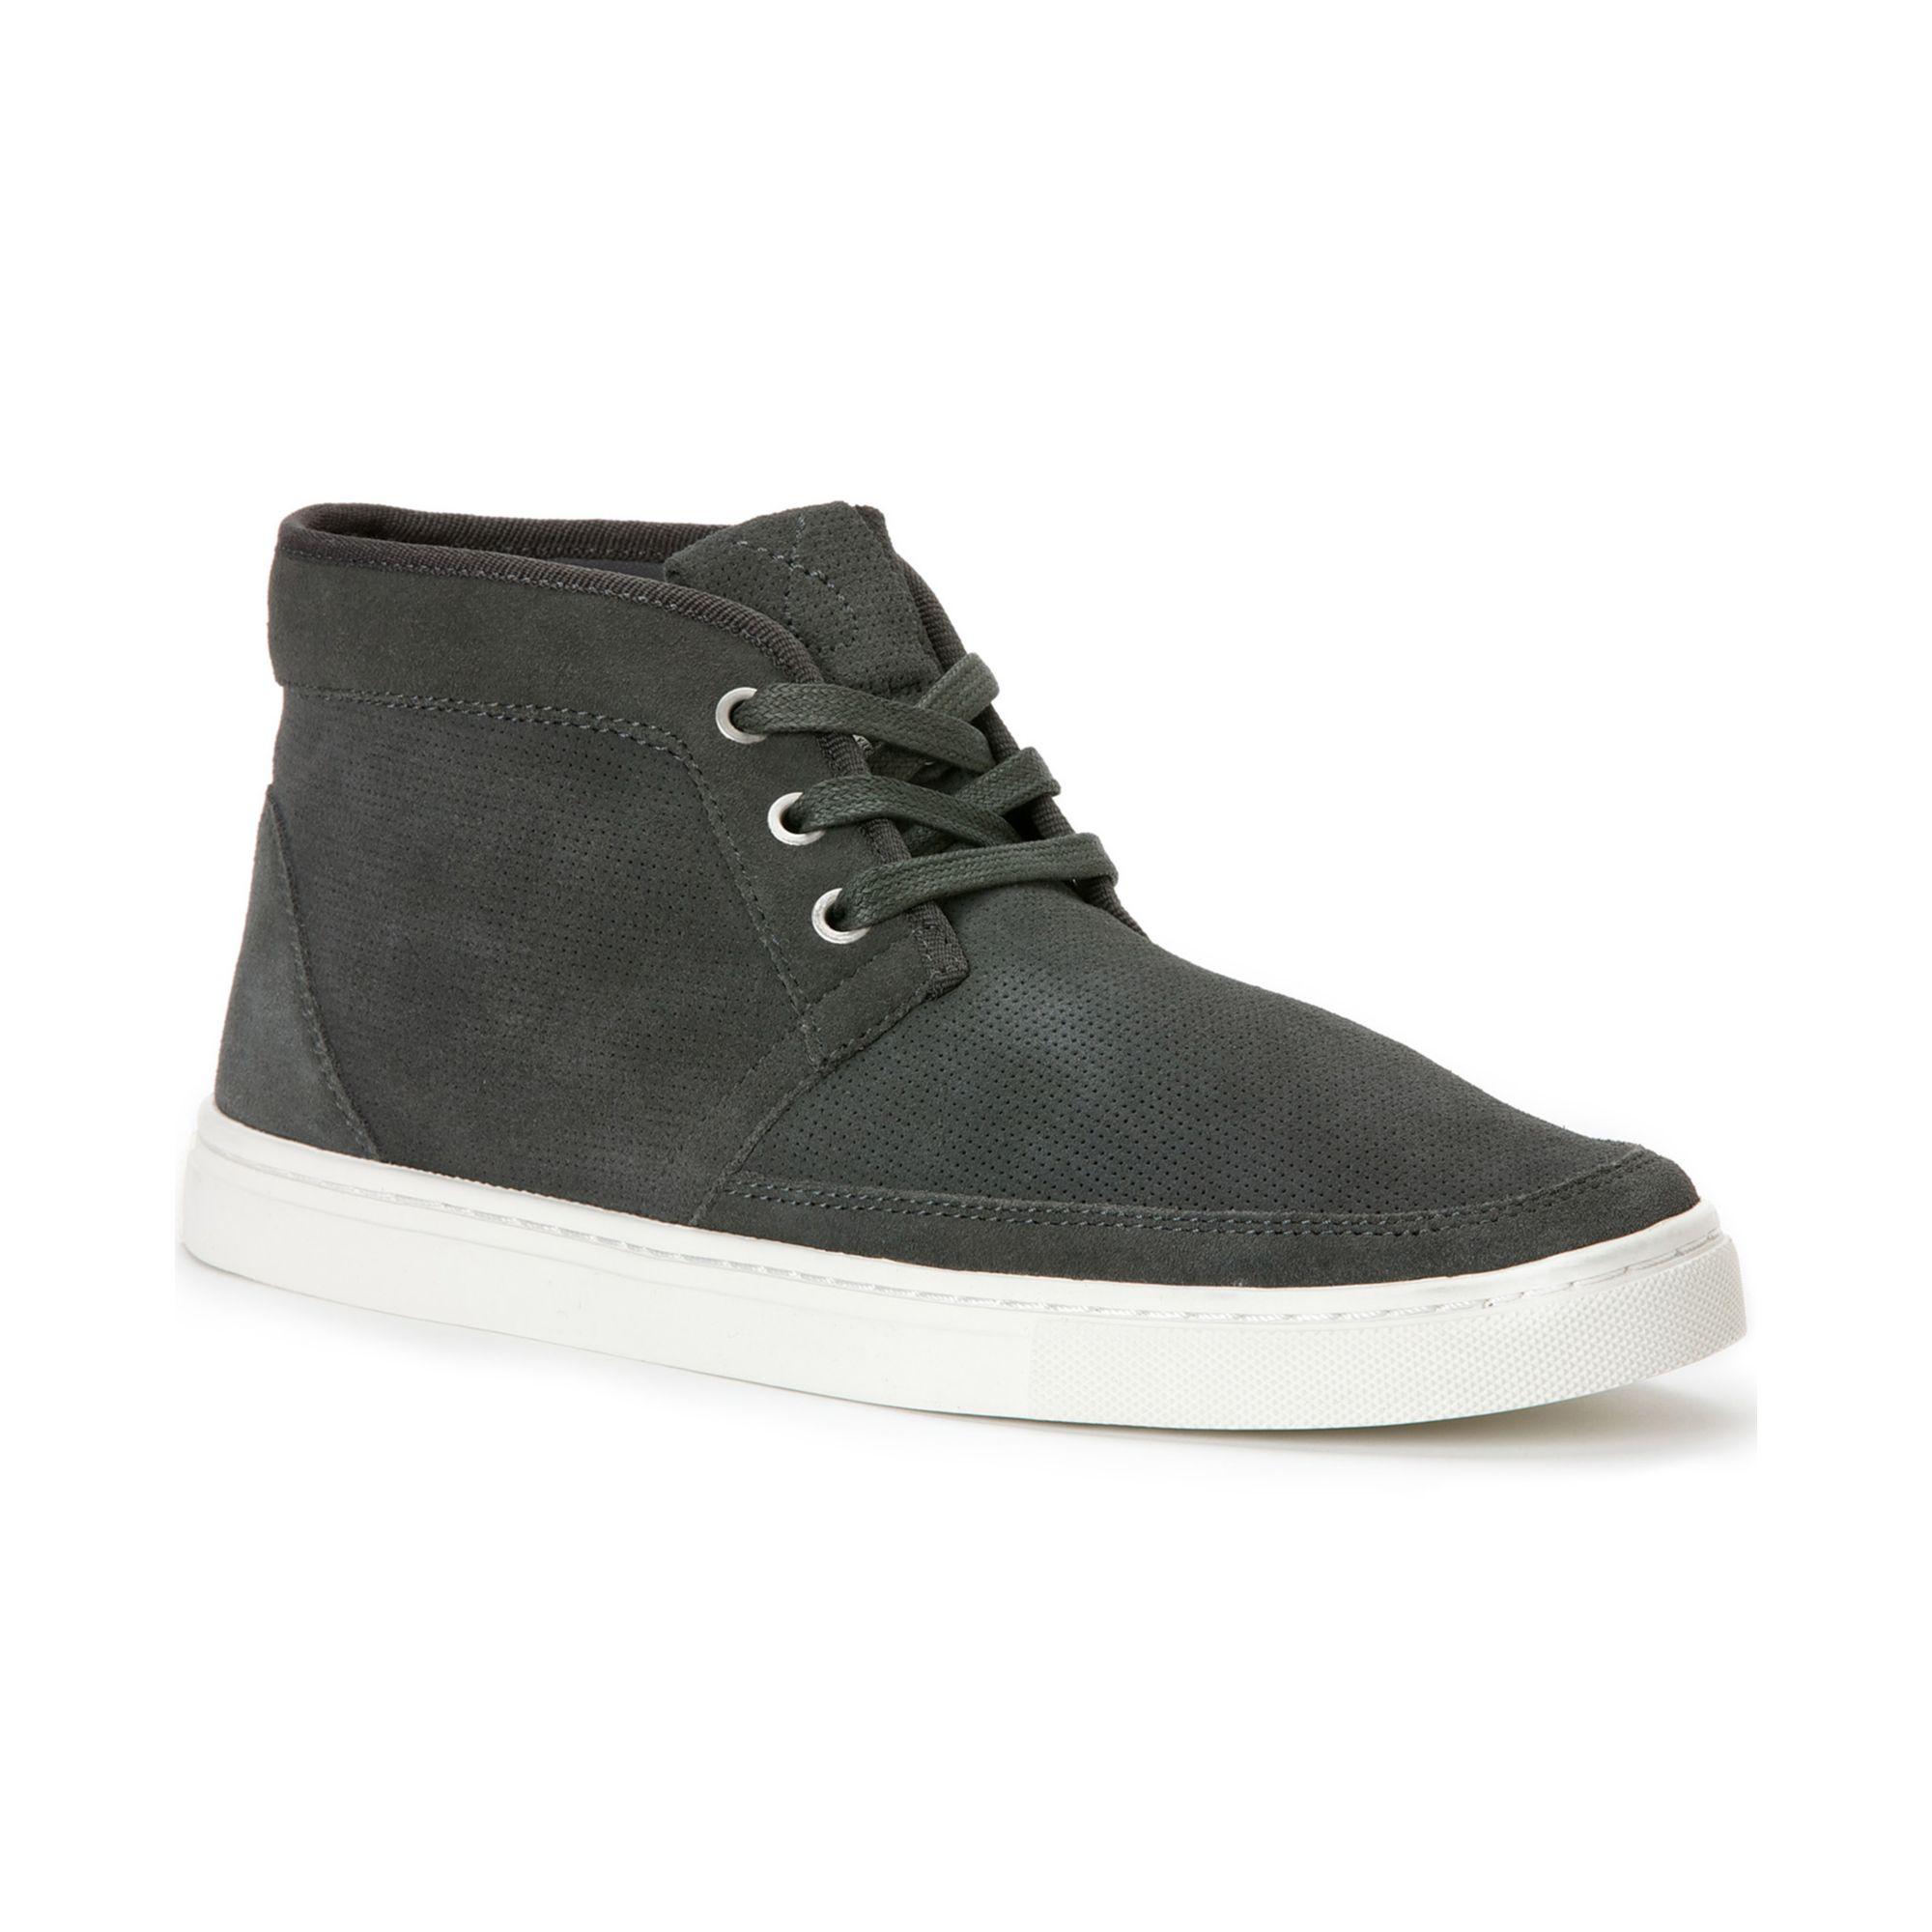 calvin klein hamlin suede boots in gray for